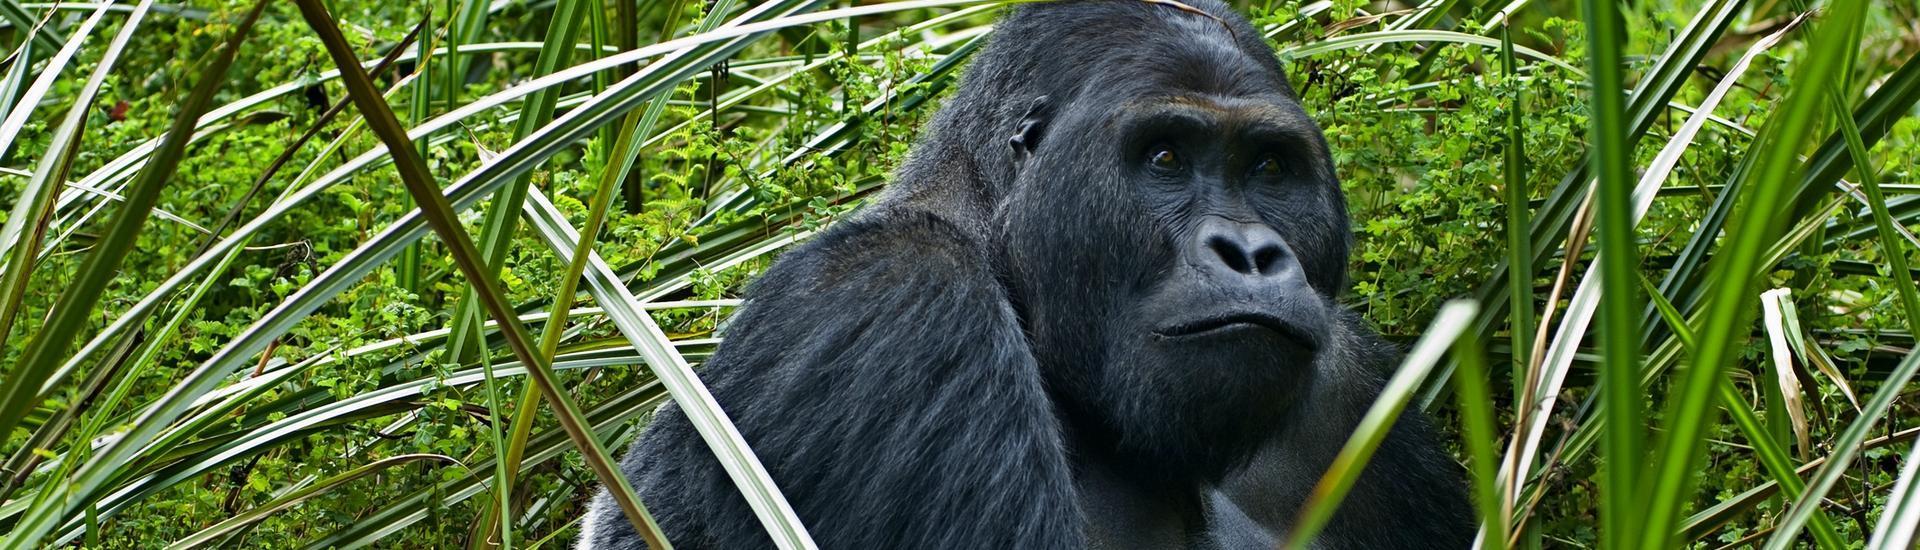 Uganda - nie tylko goryle!